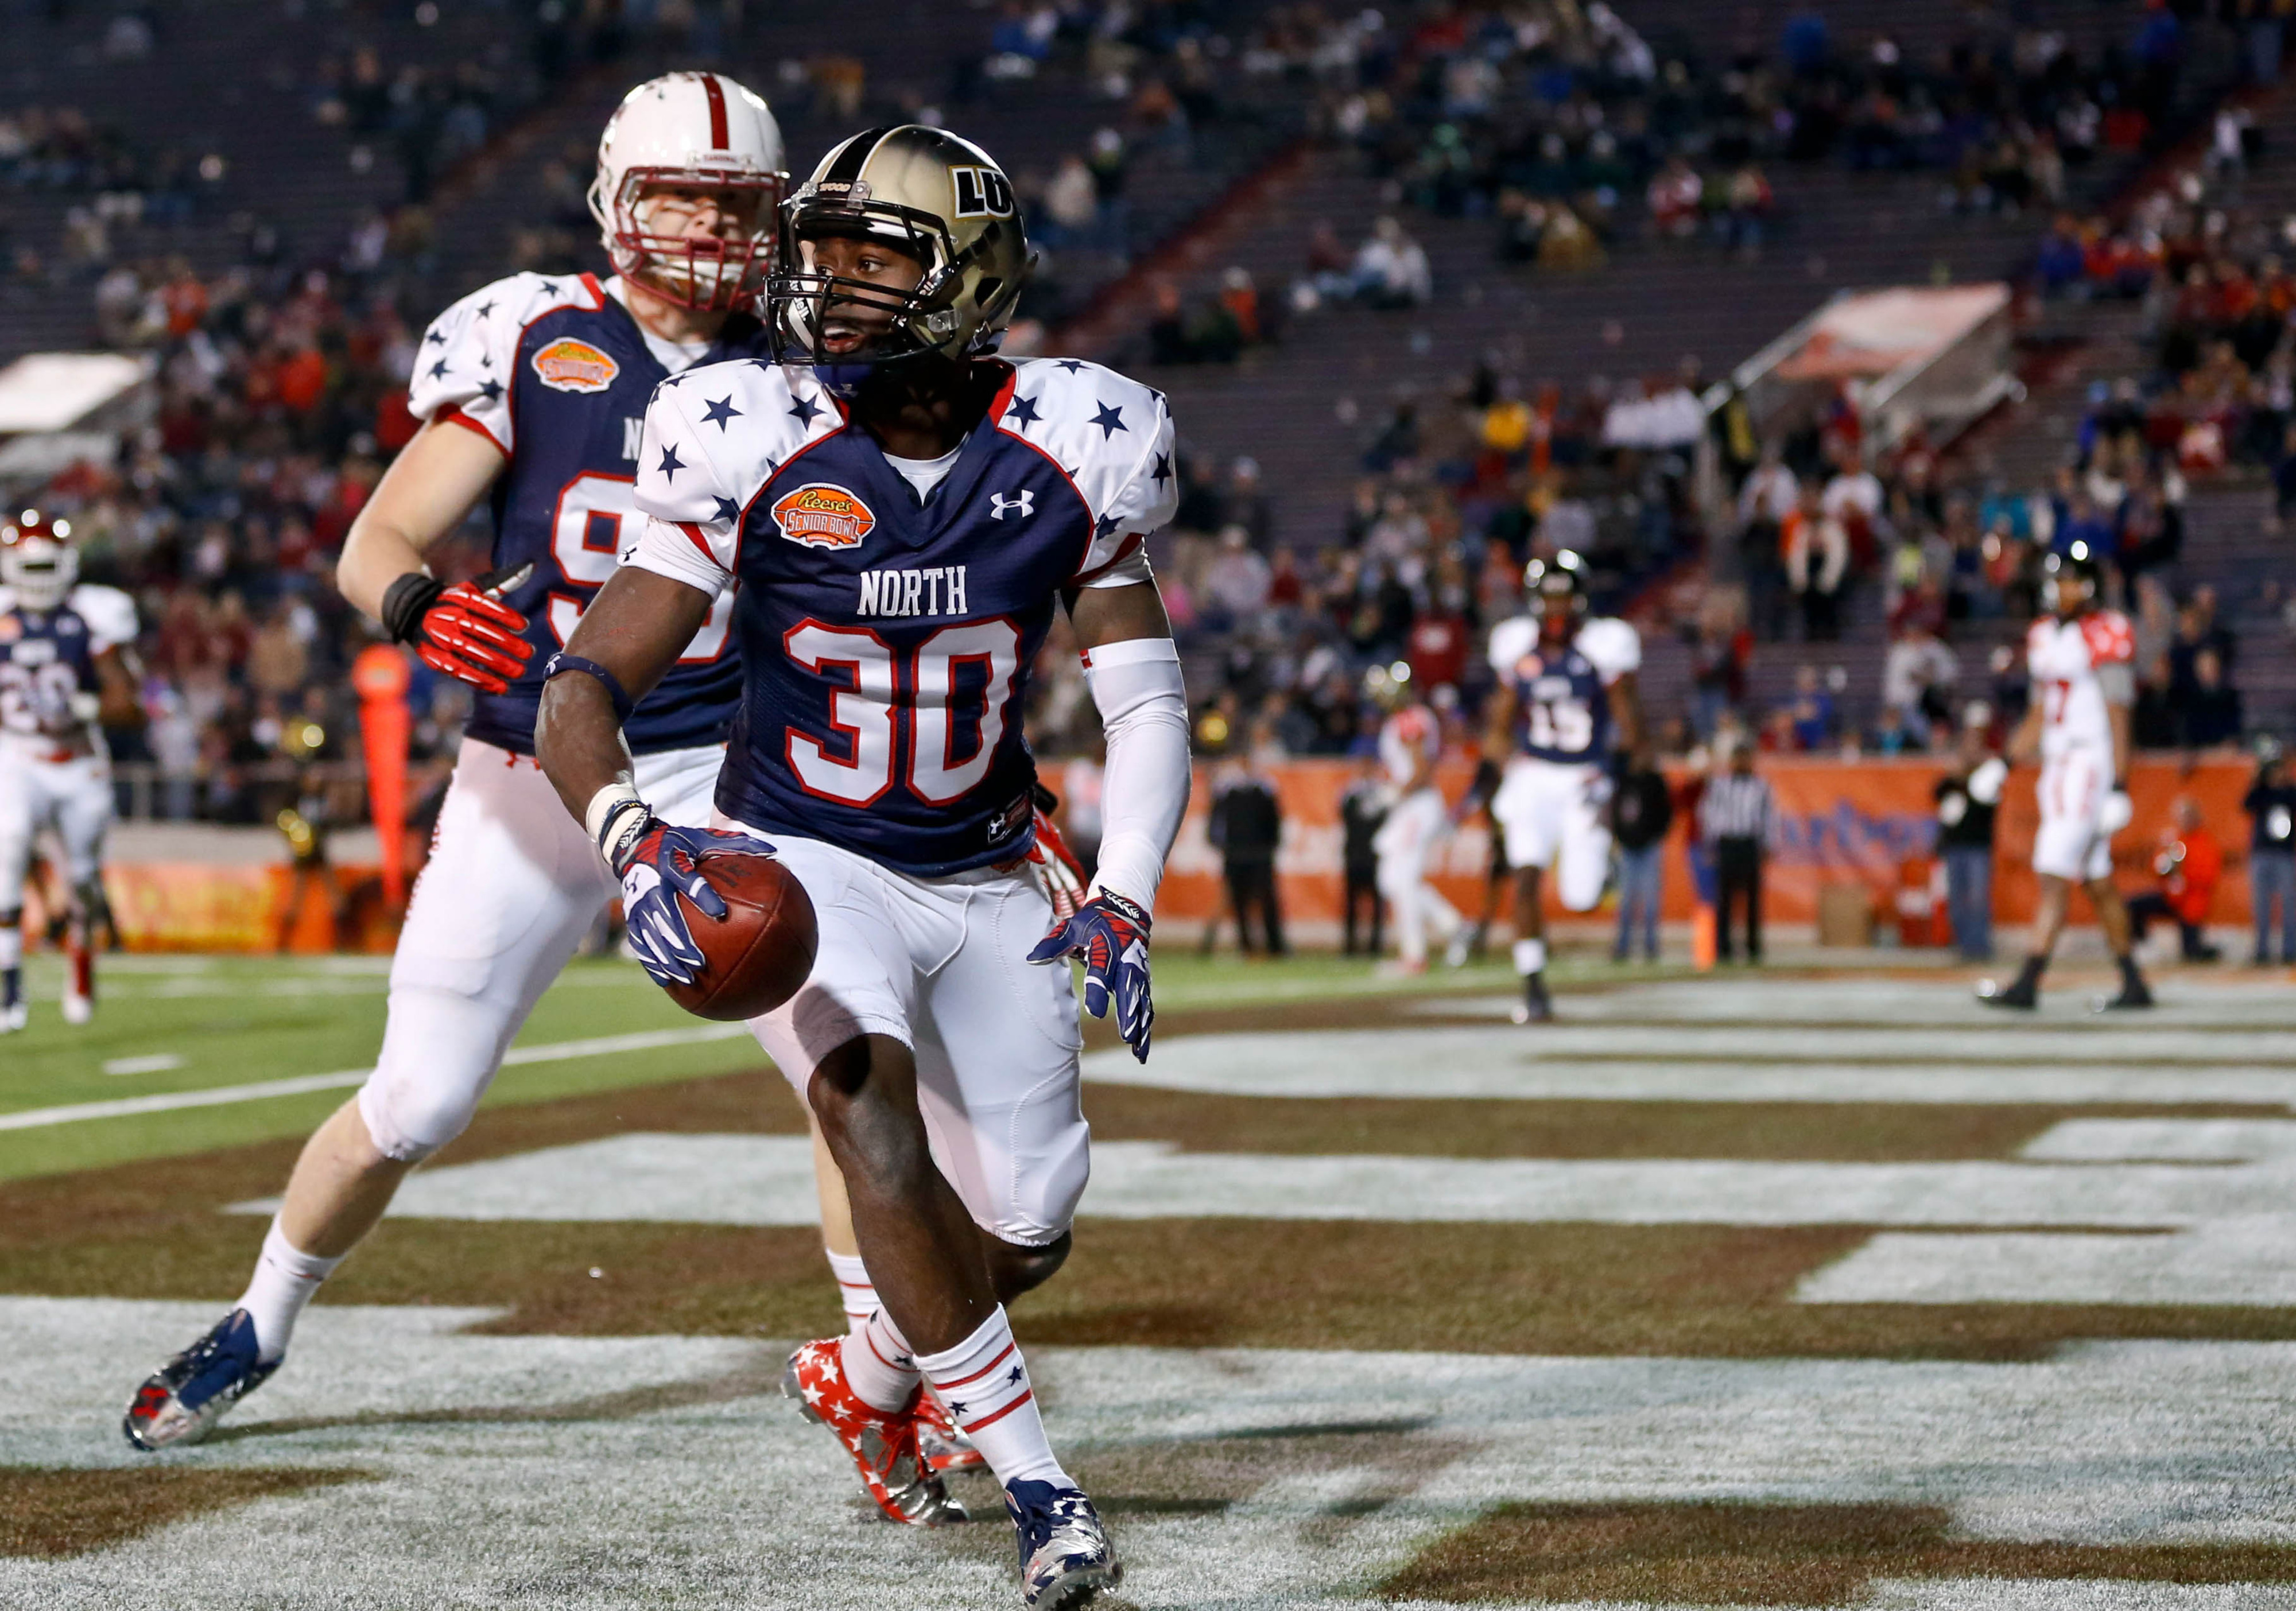 Desir celebrates returning an interception for a touchdown